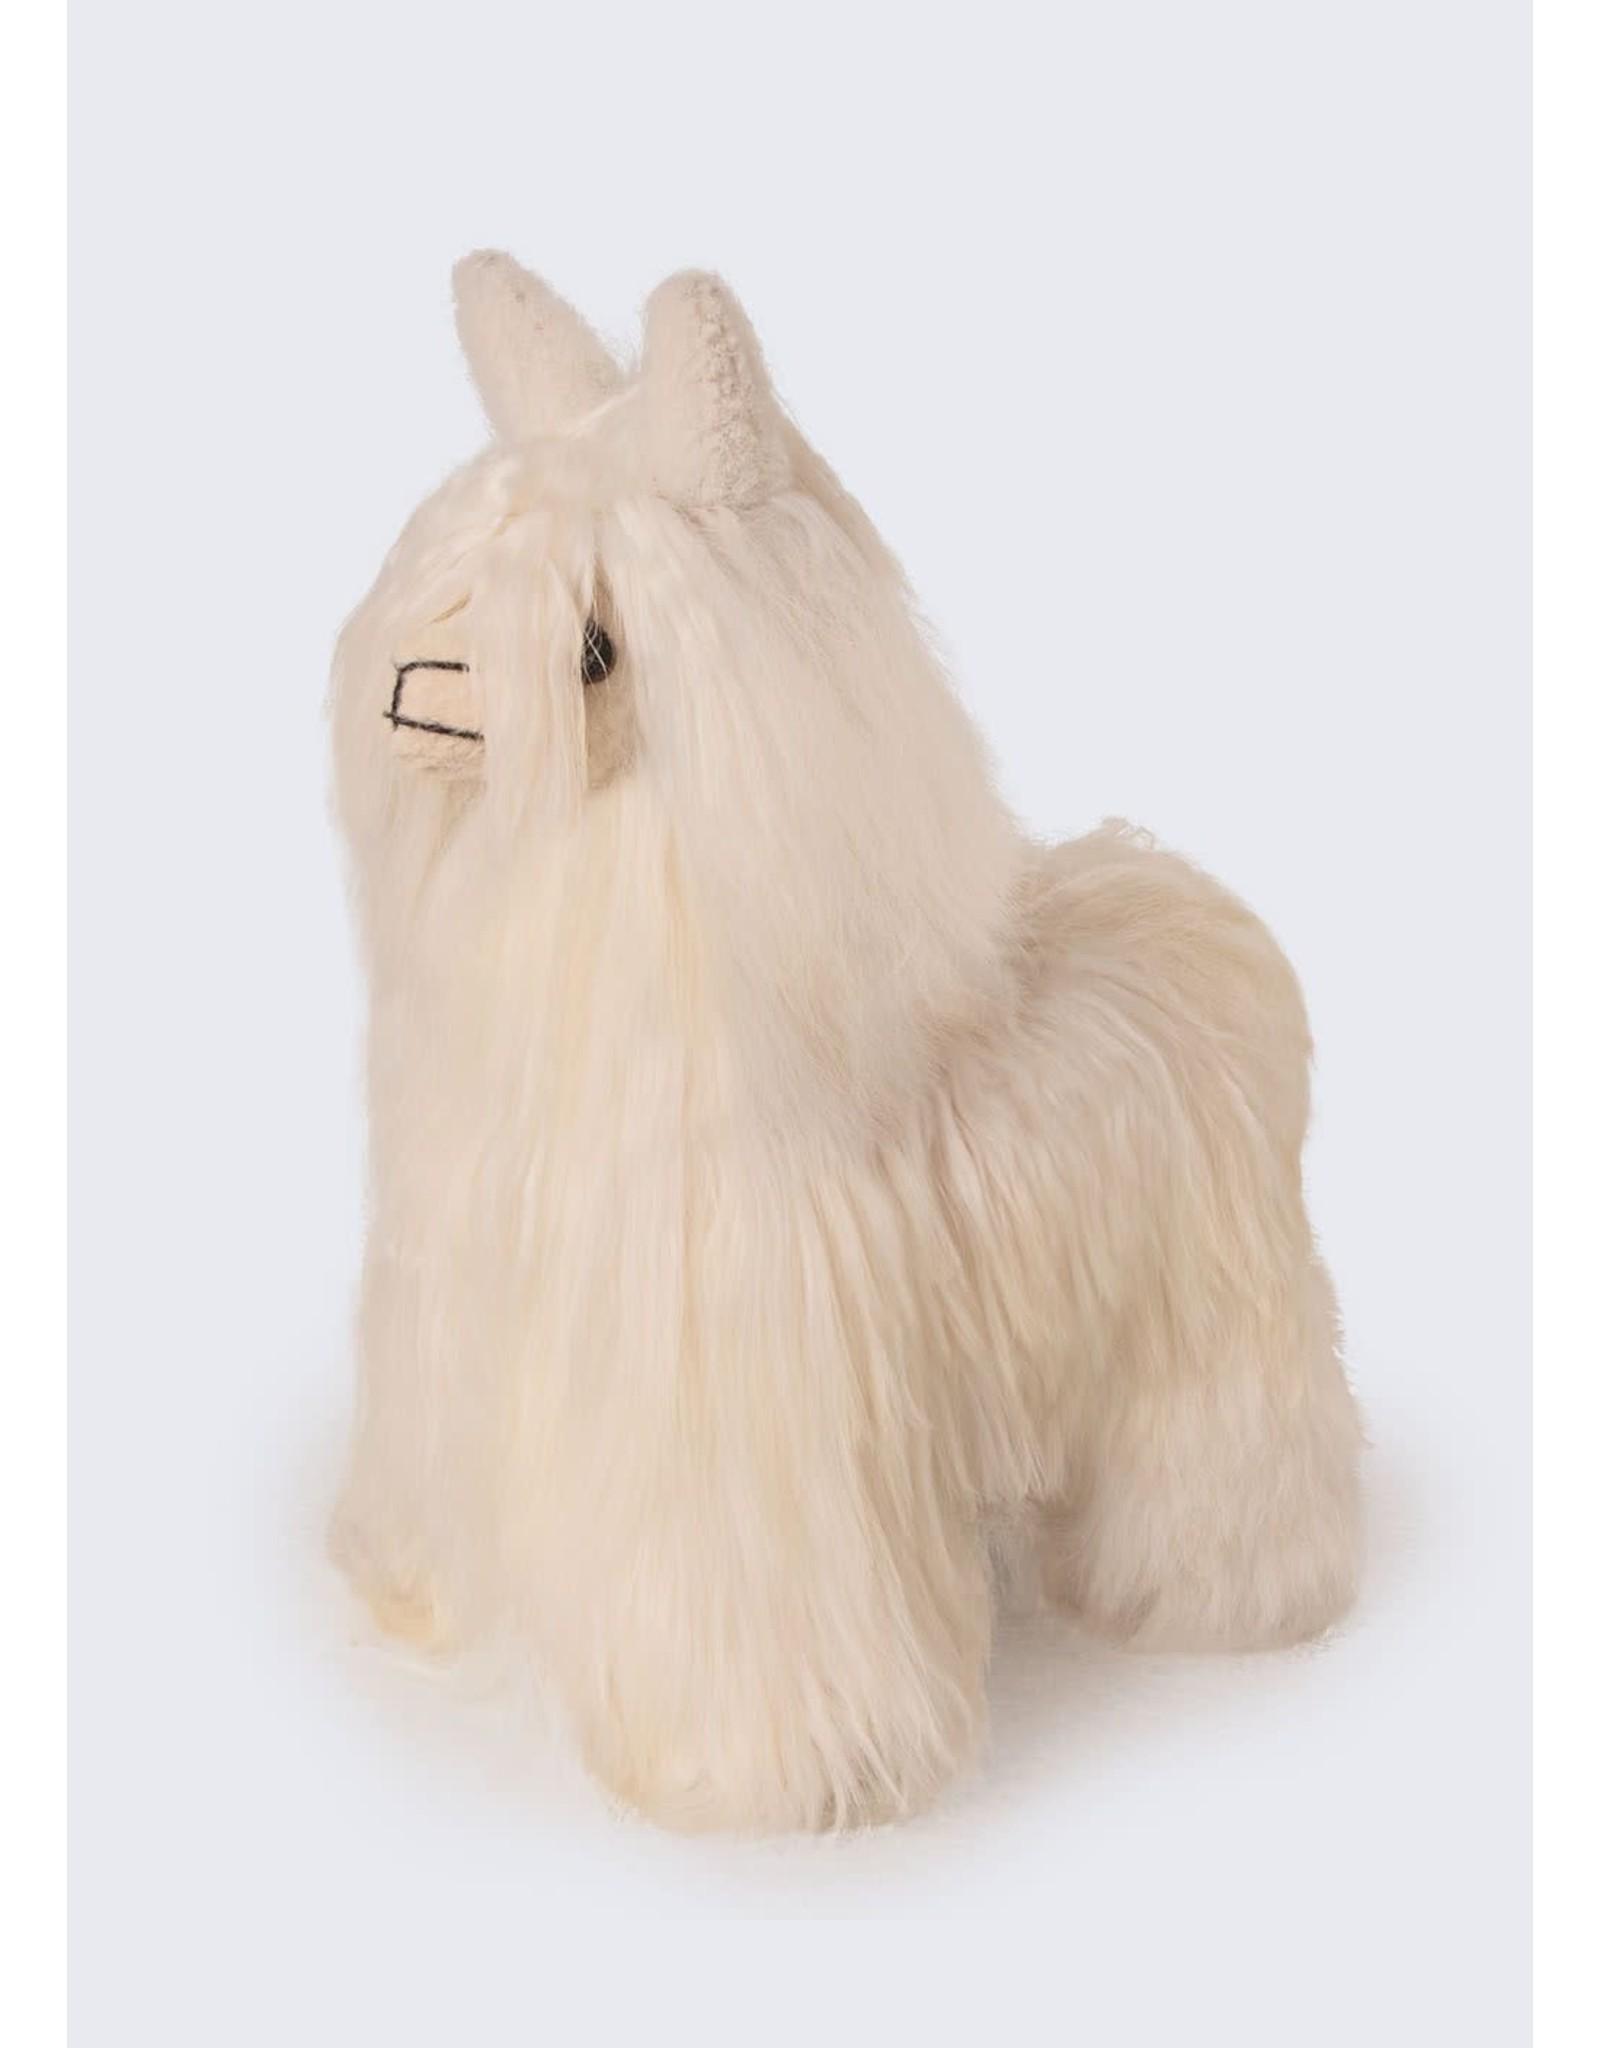 "8"" Baby Alpaca Suri Fur Standing Alpaca Plush"